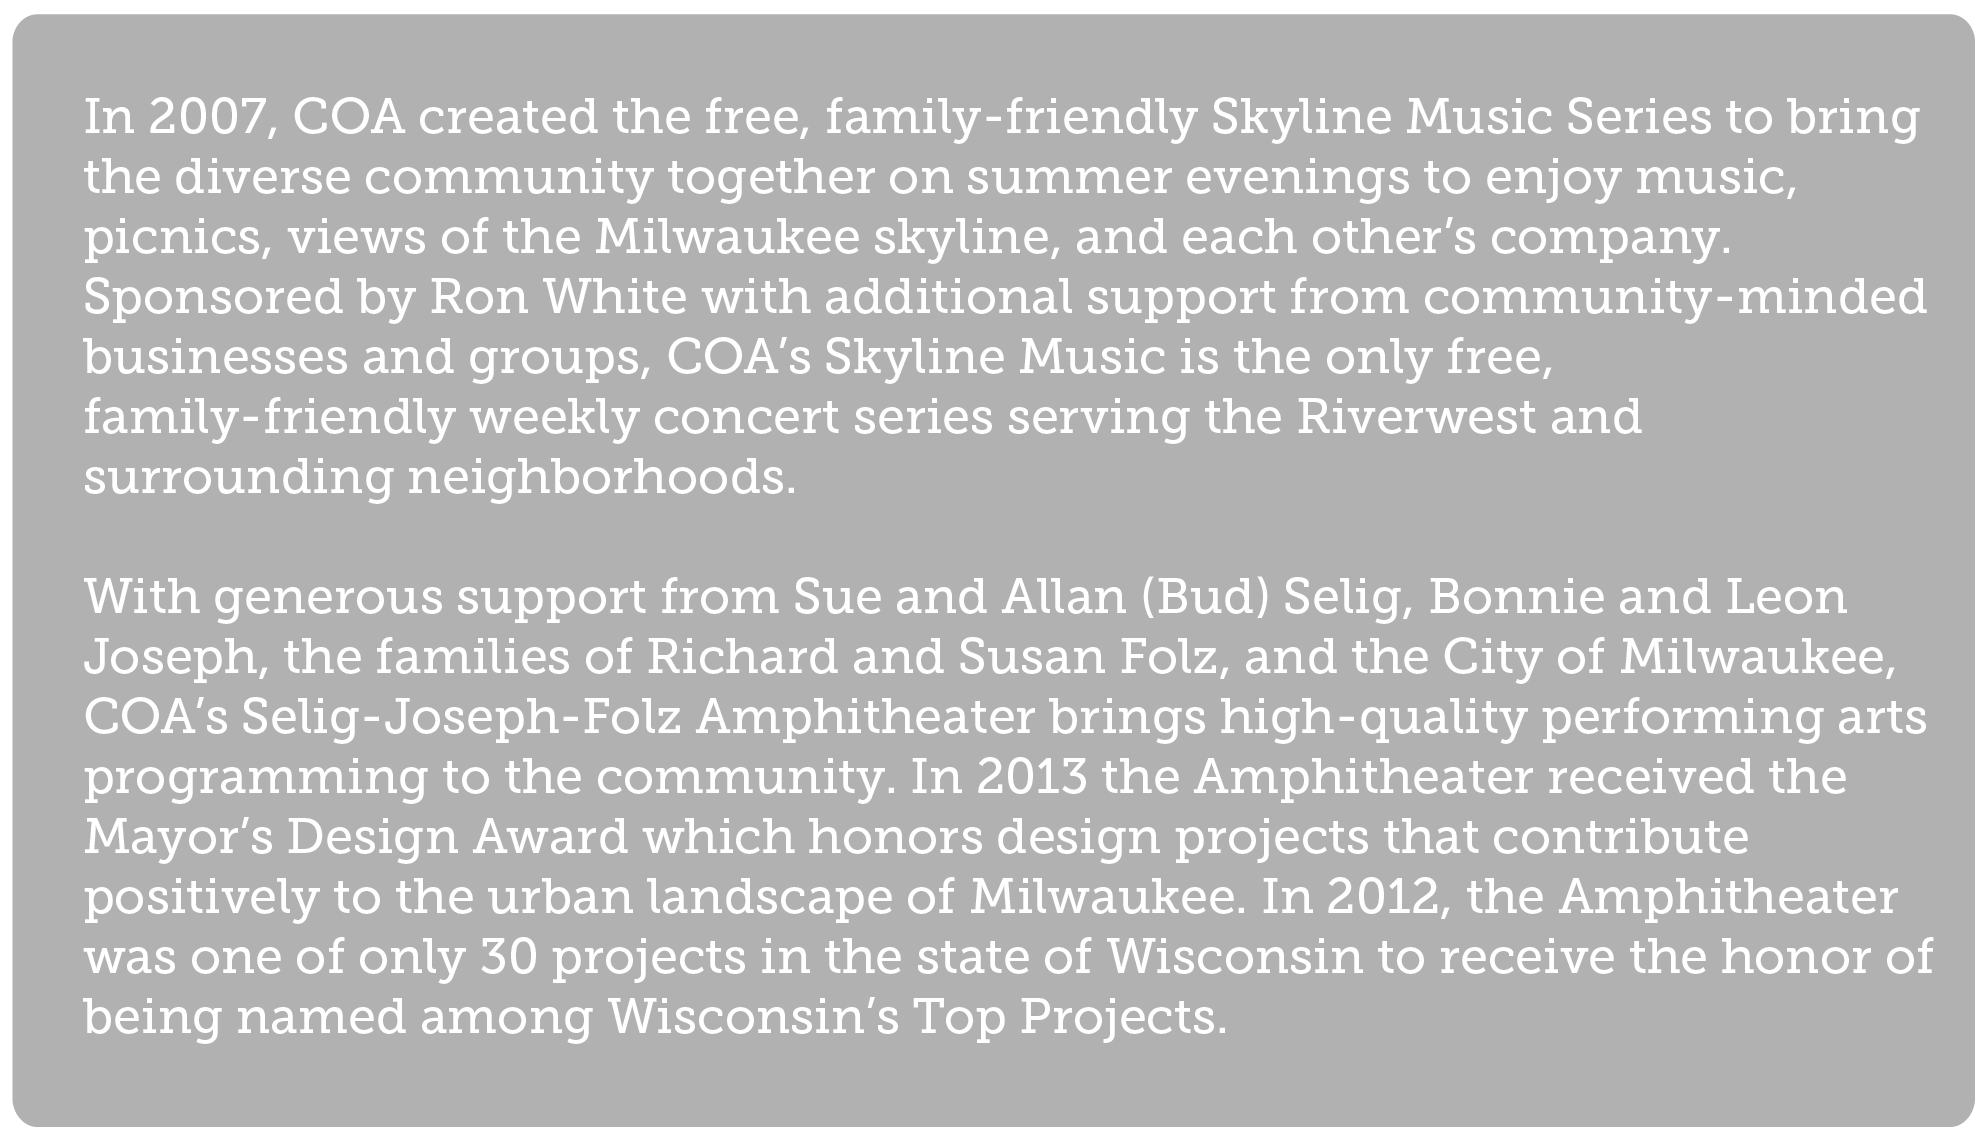 CommunityDevelopment-Skyline-02